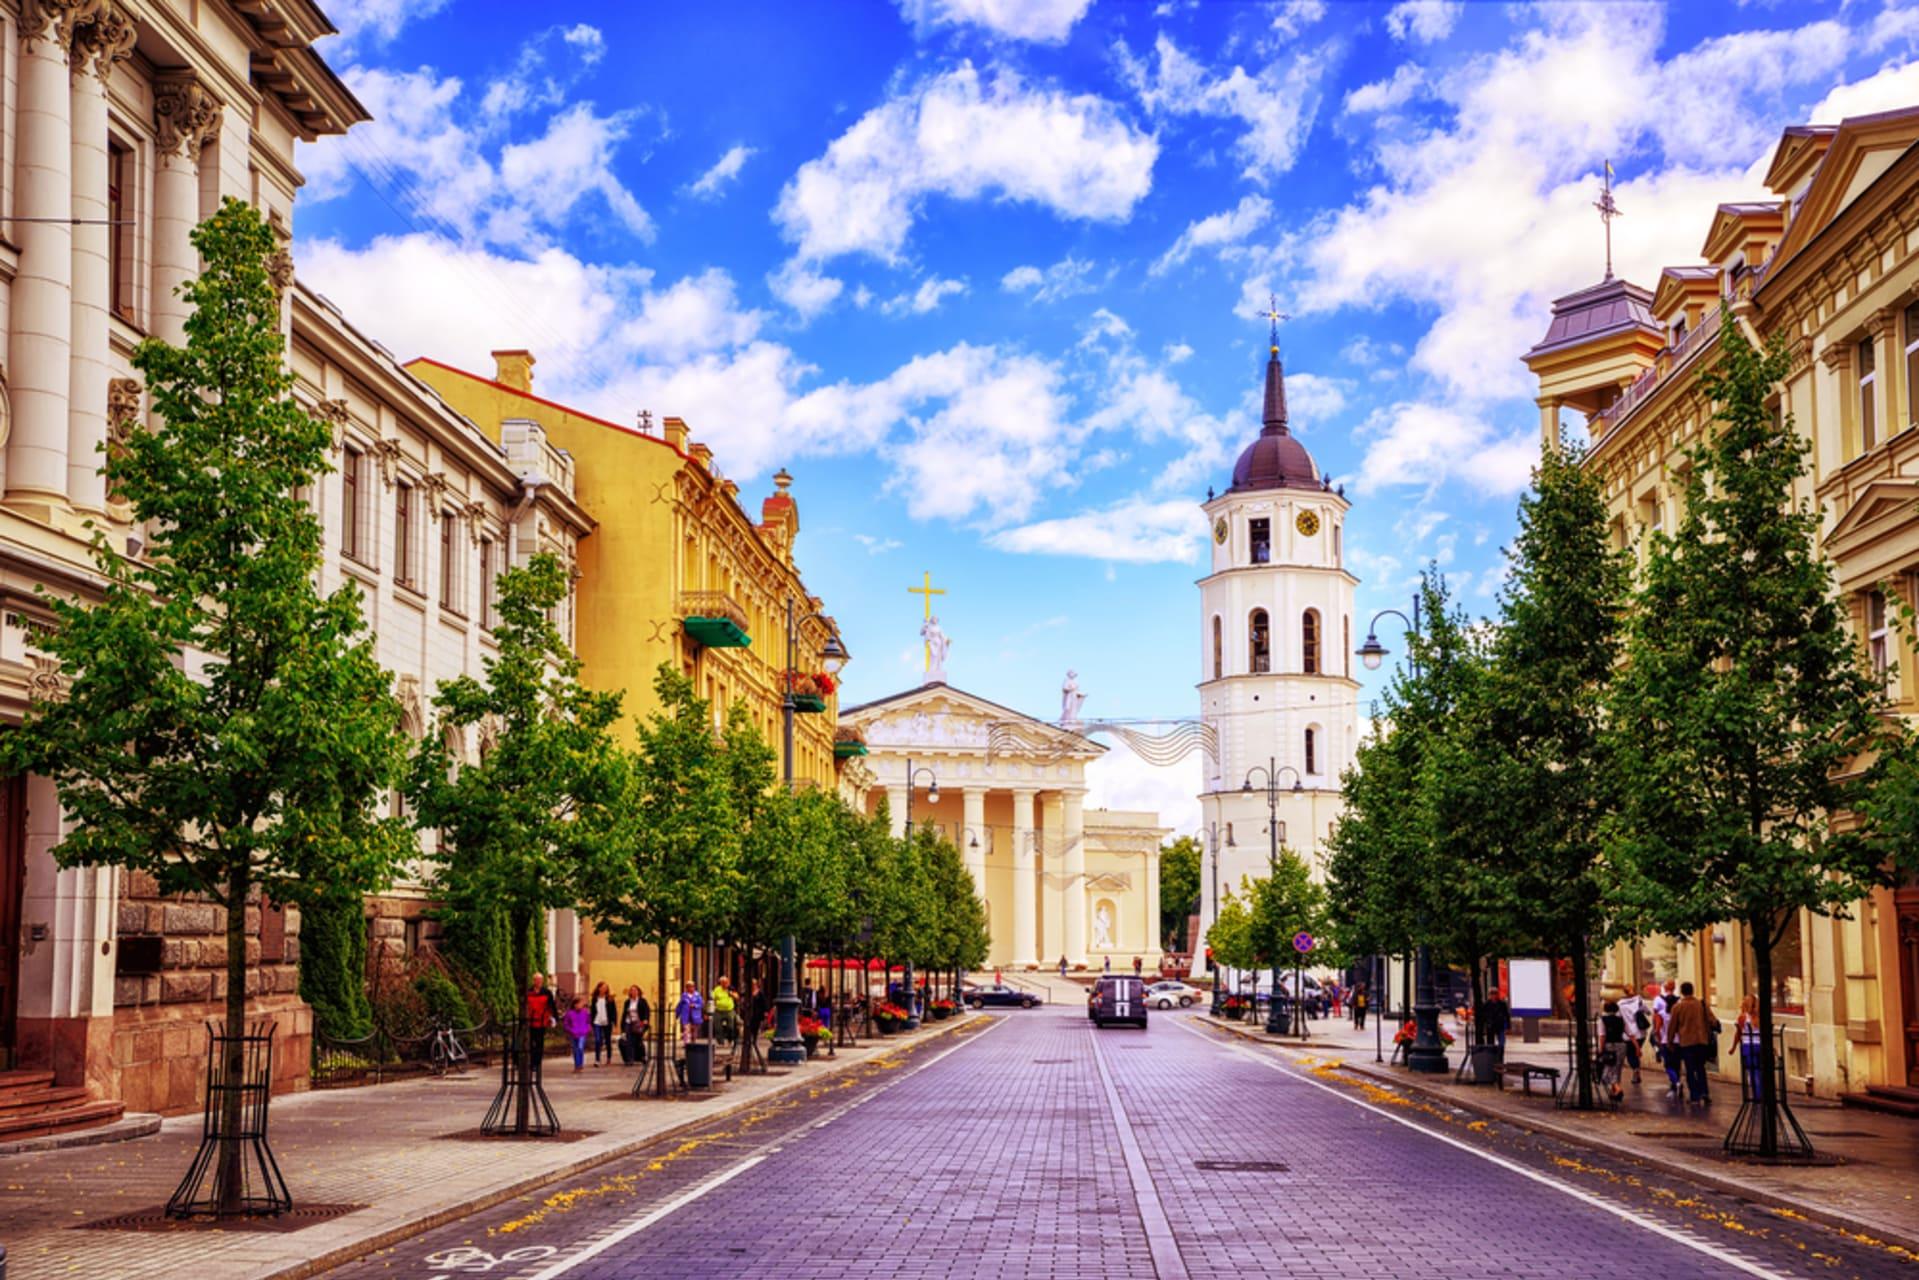 Vilnius - Vilnius Old Town Highlights. Part One